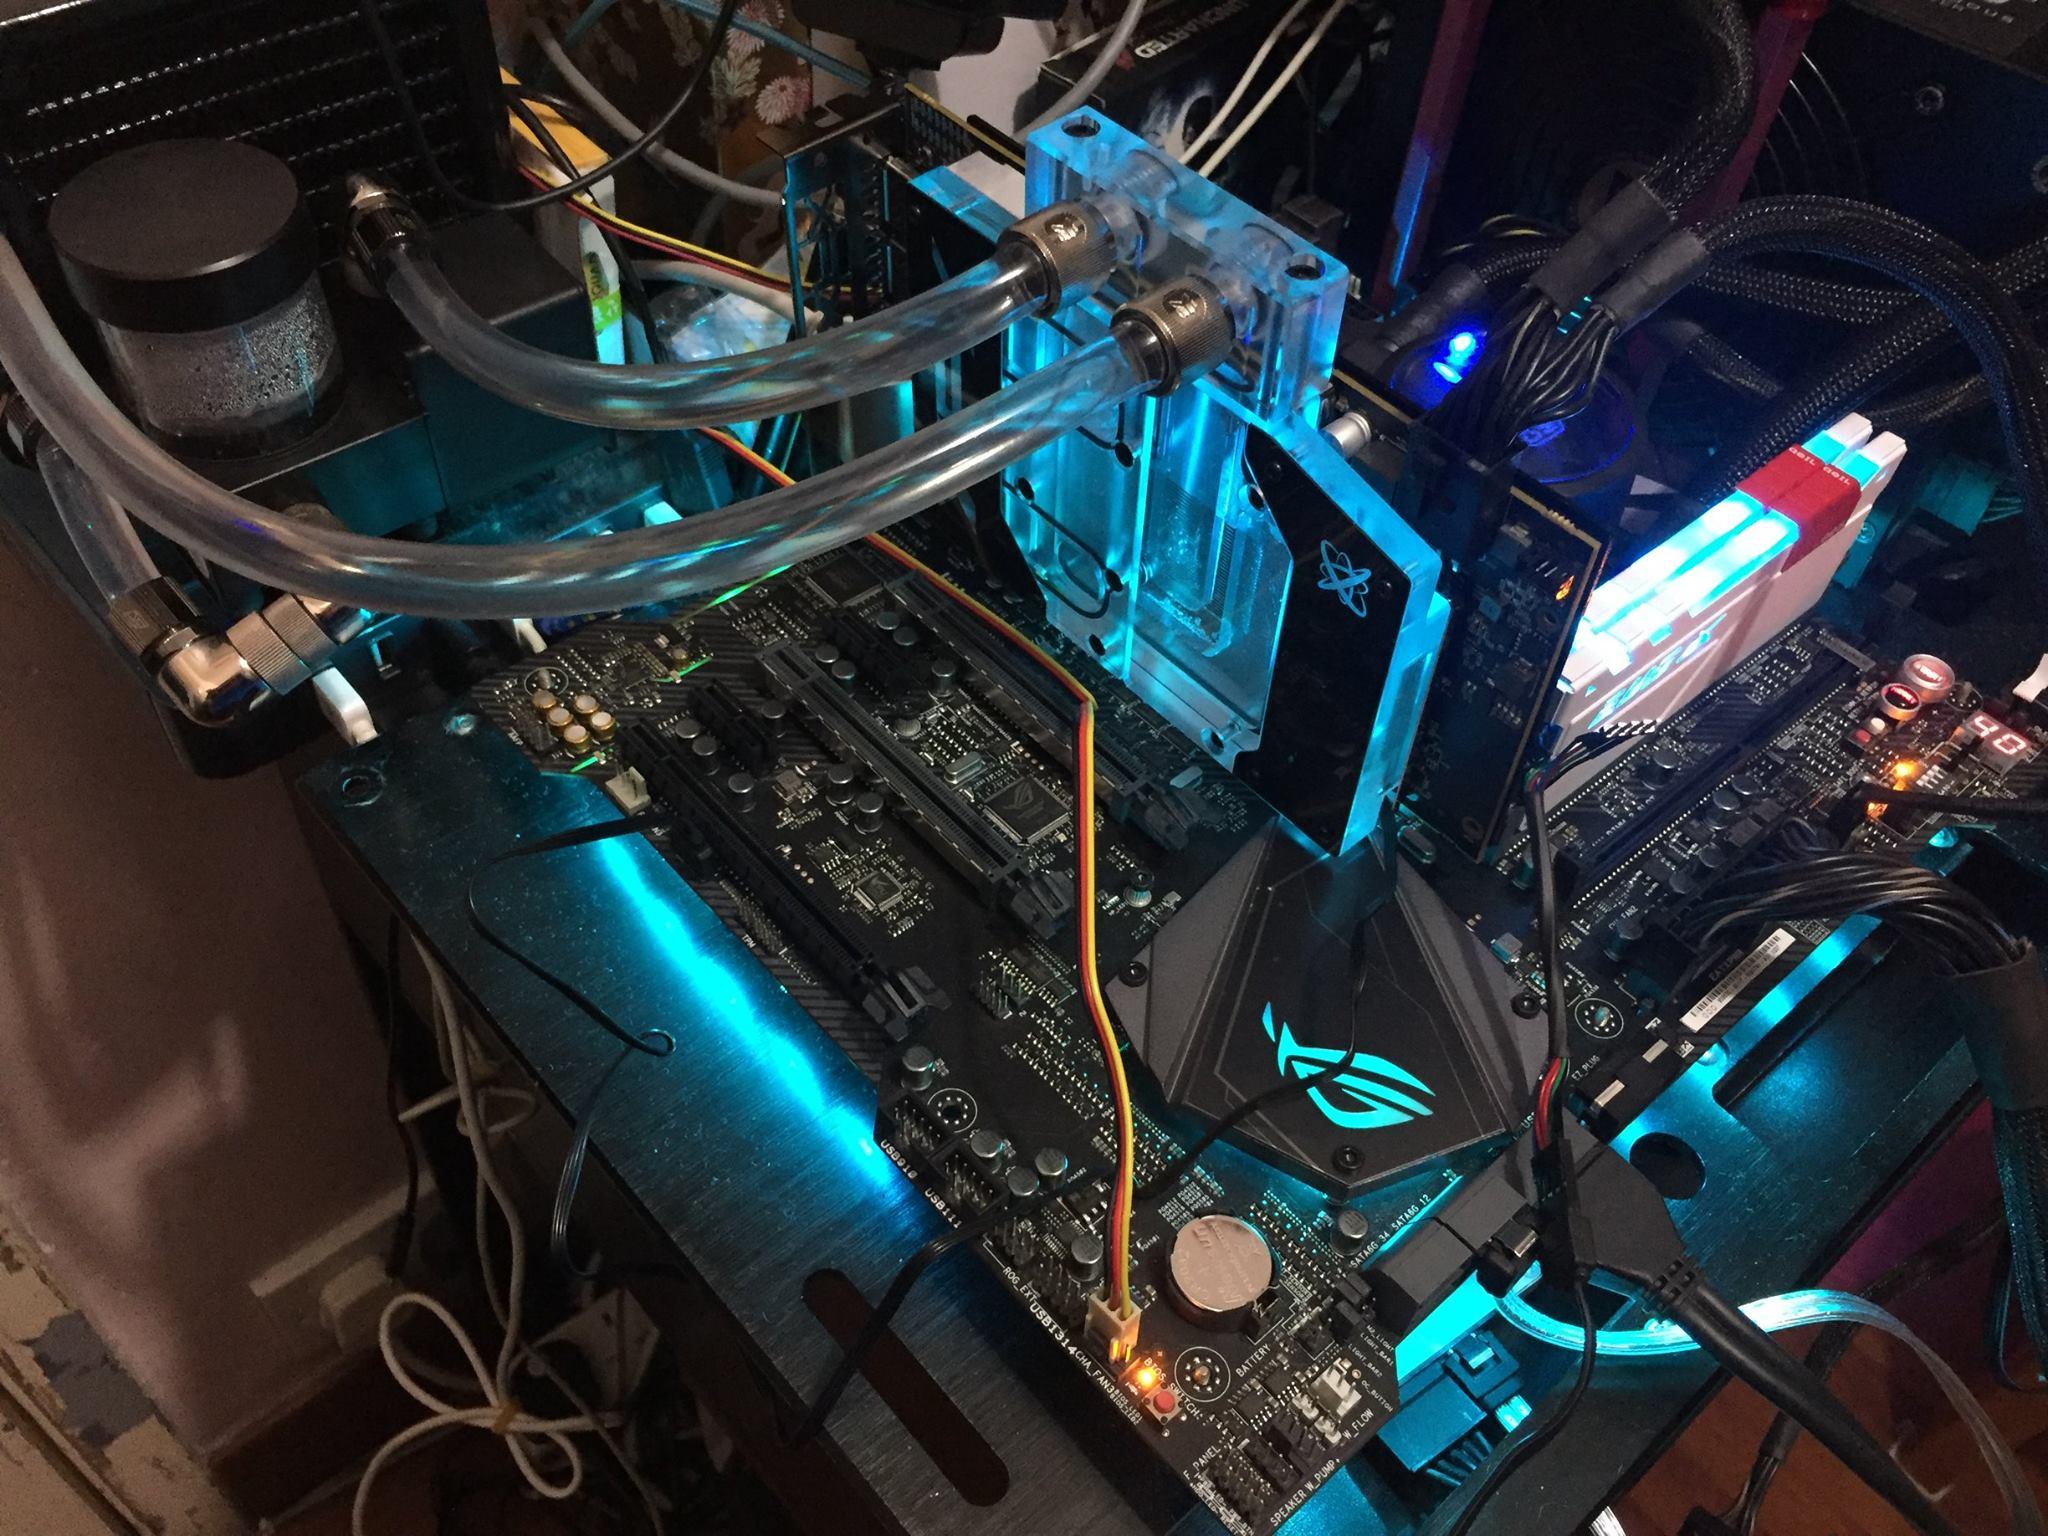 XFX Radeon RX 580